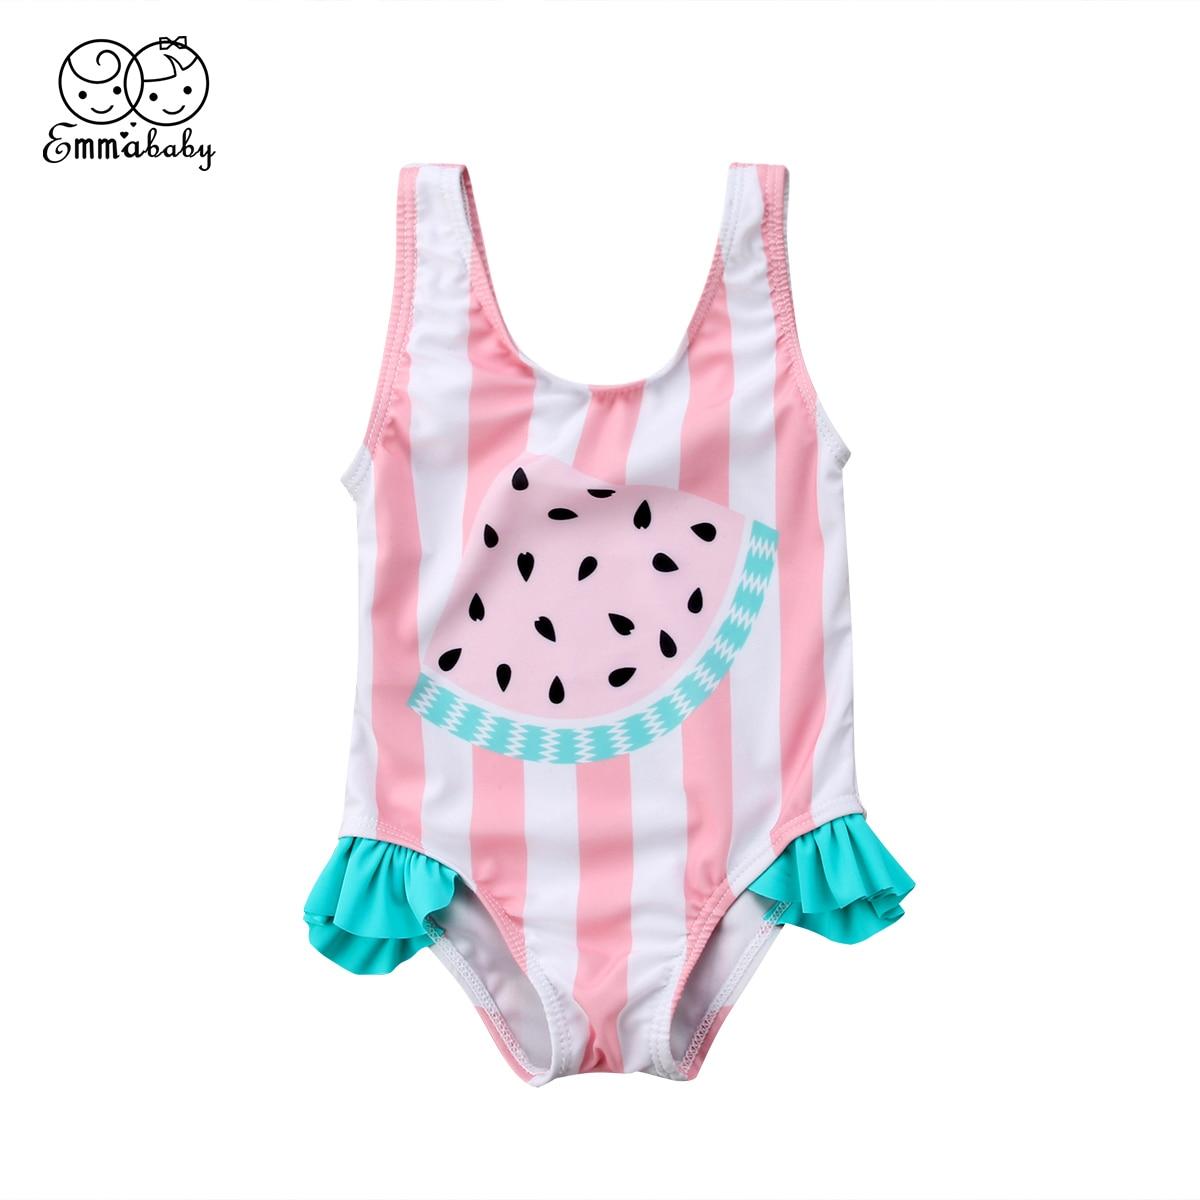 Newest Baby Girl Striped Swimsuit Fashion Cute Watermelon Print Swimwear One-piece Bikini Bathing Suit Beachwear Baby Clothes Купальник